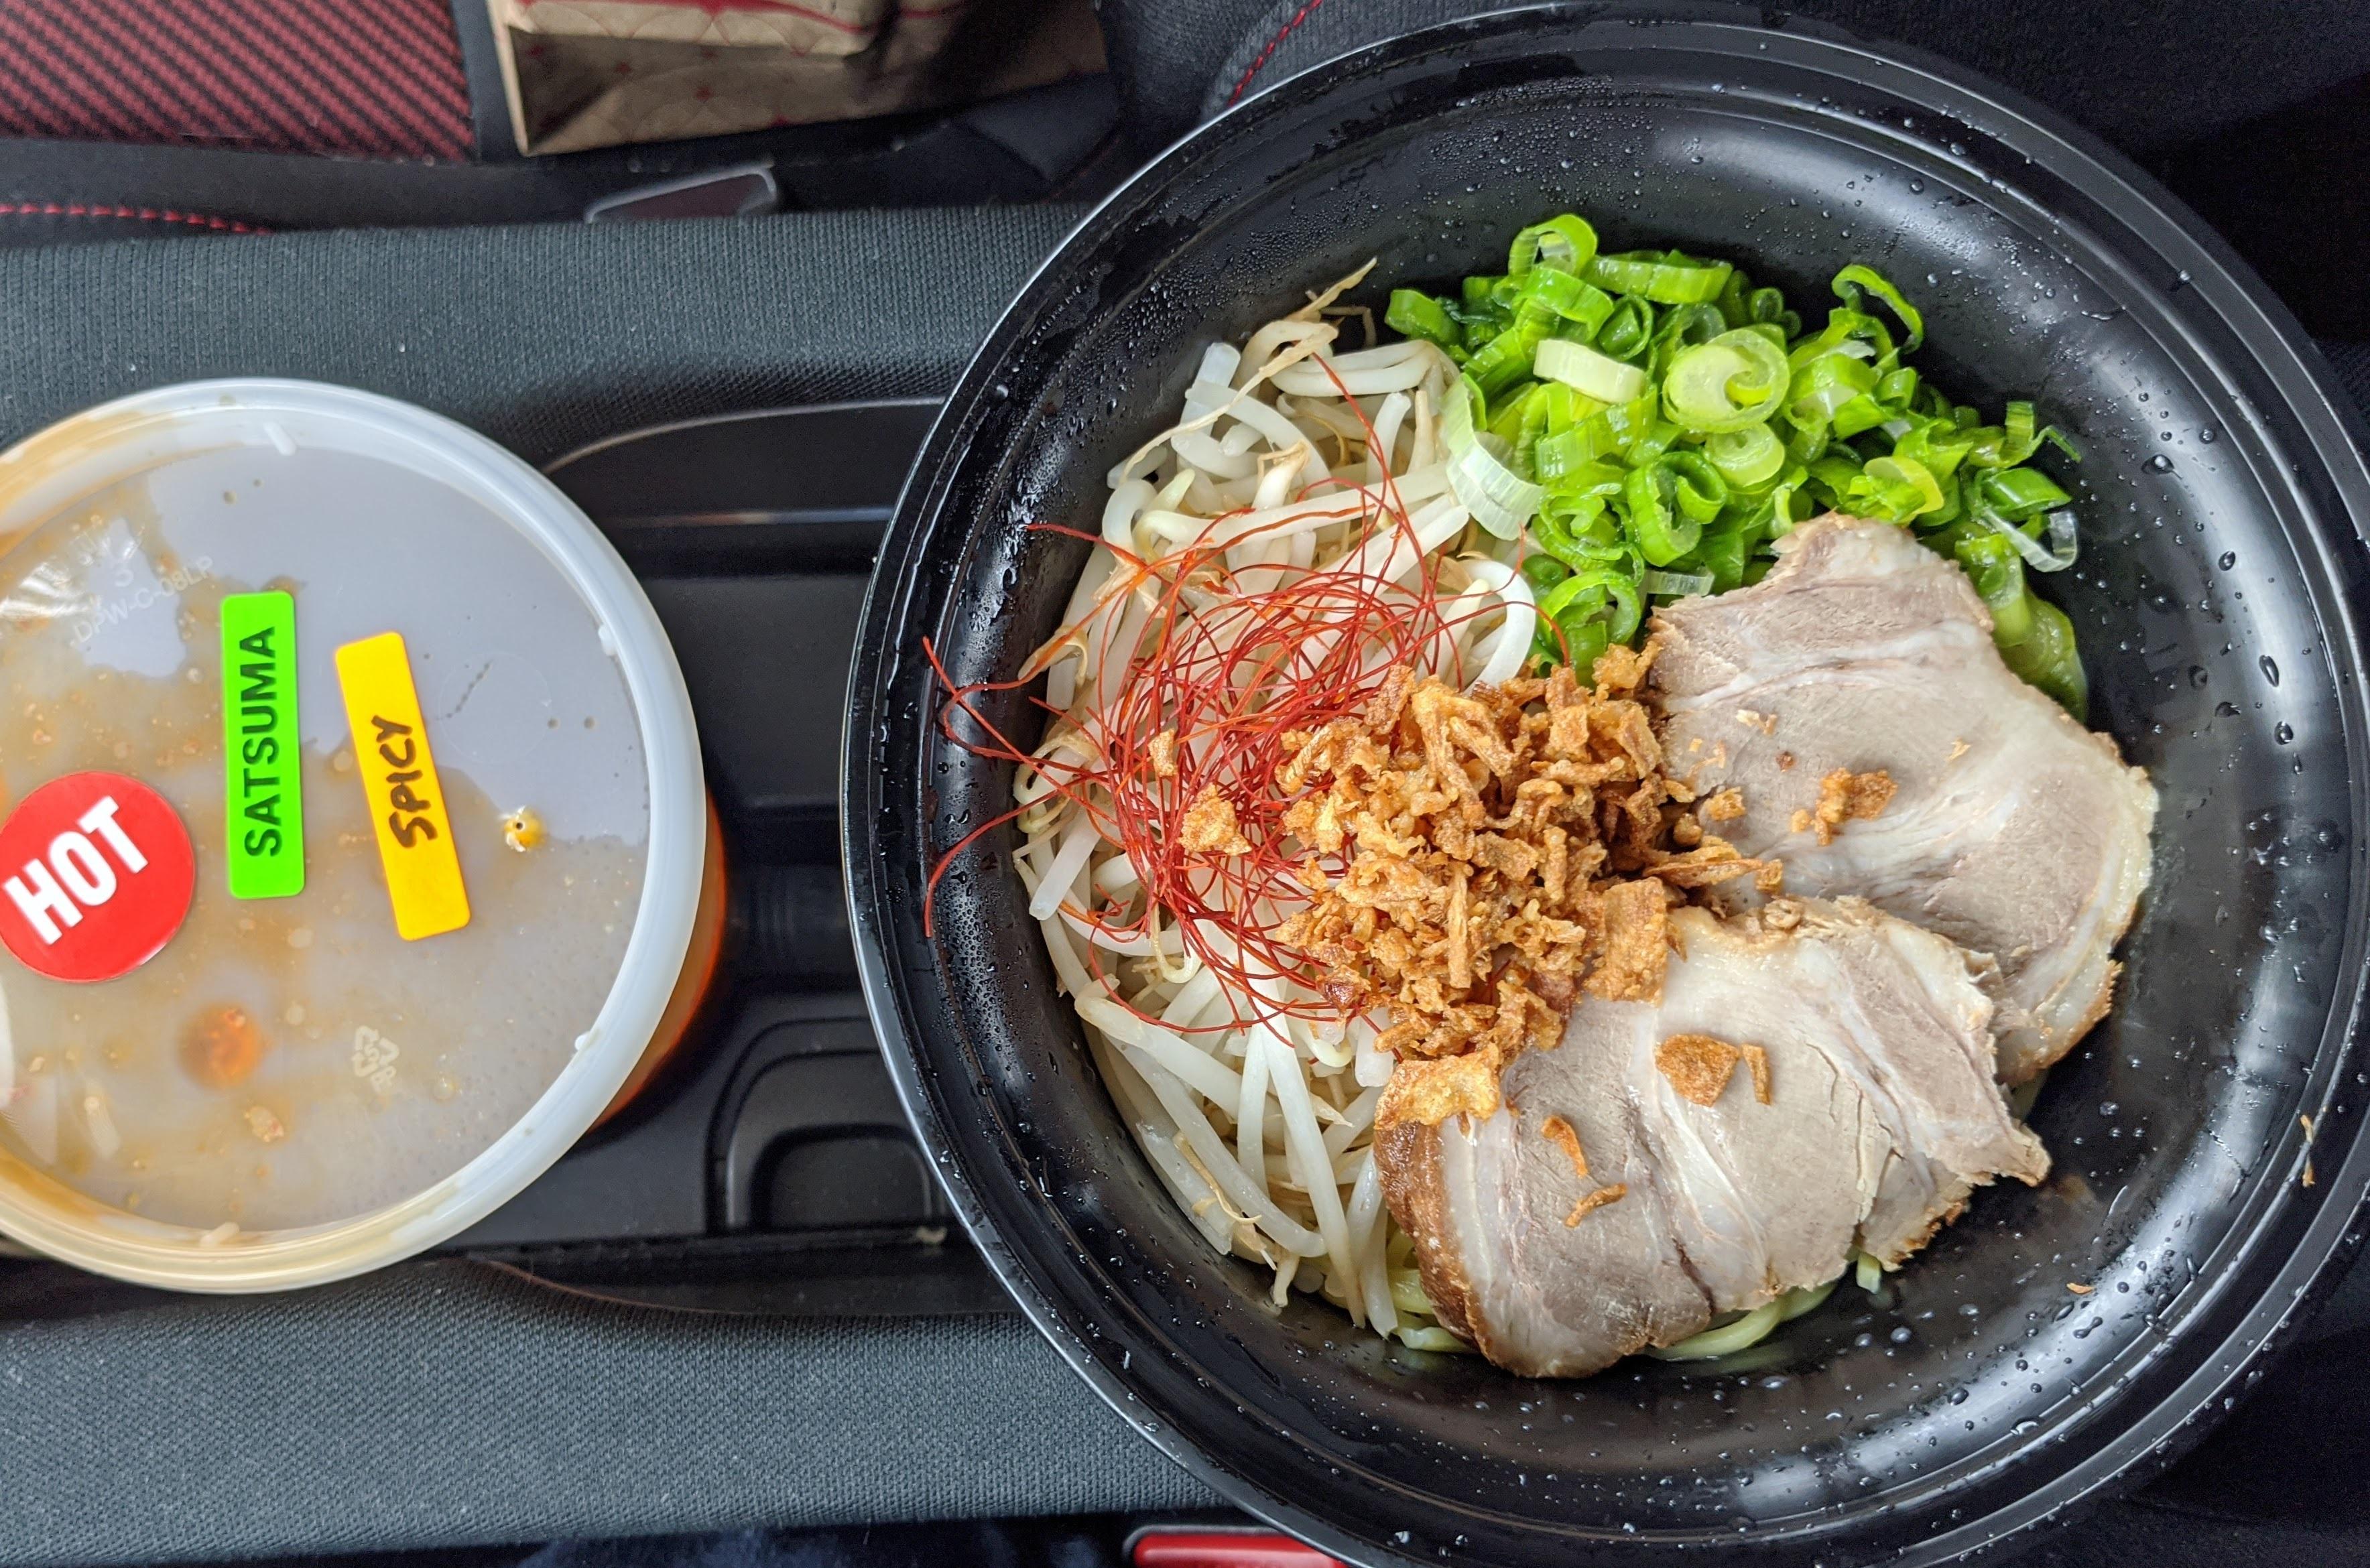 Takeout ramen bowl from Shin Sen Gumi Express in Gardena